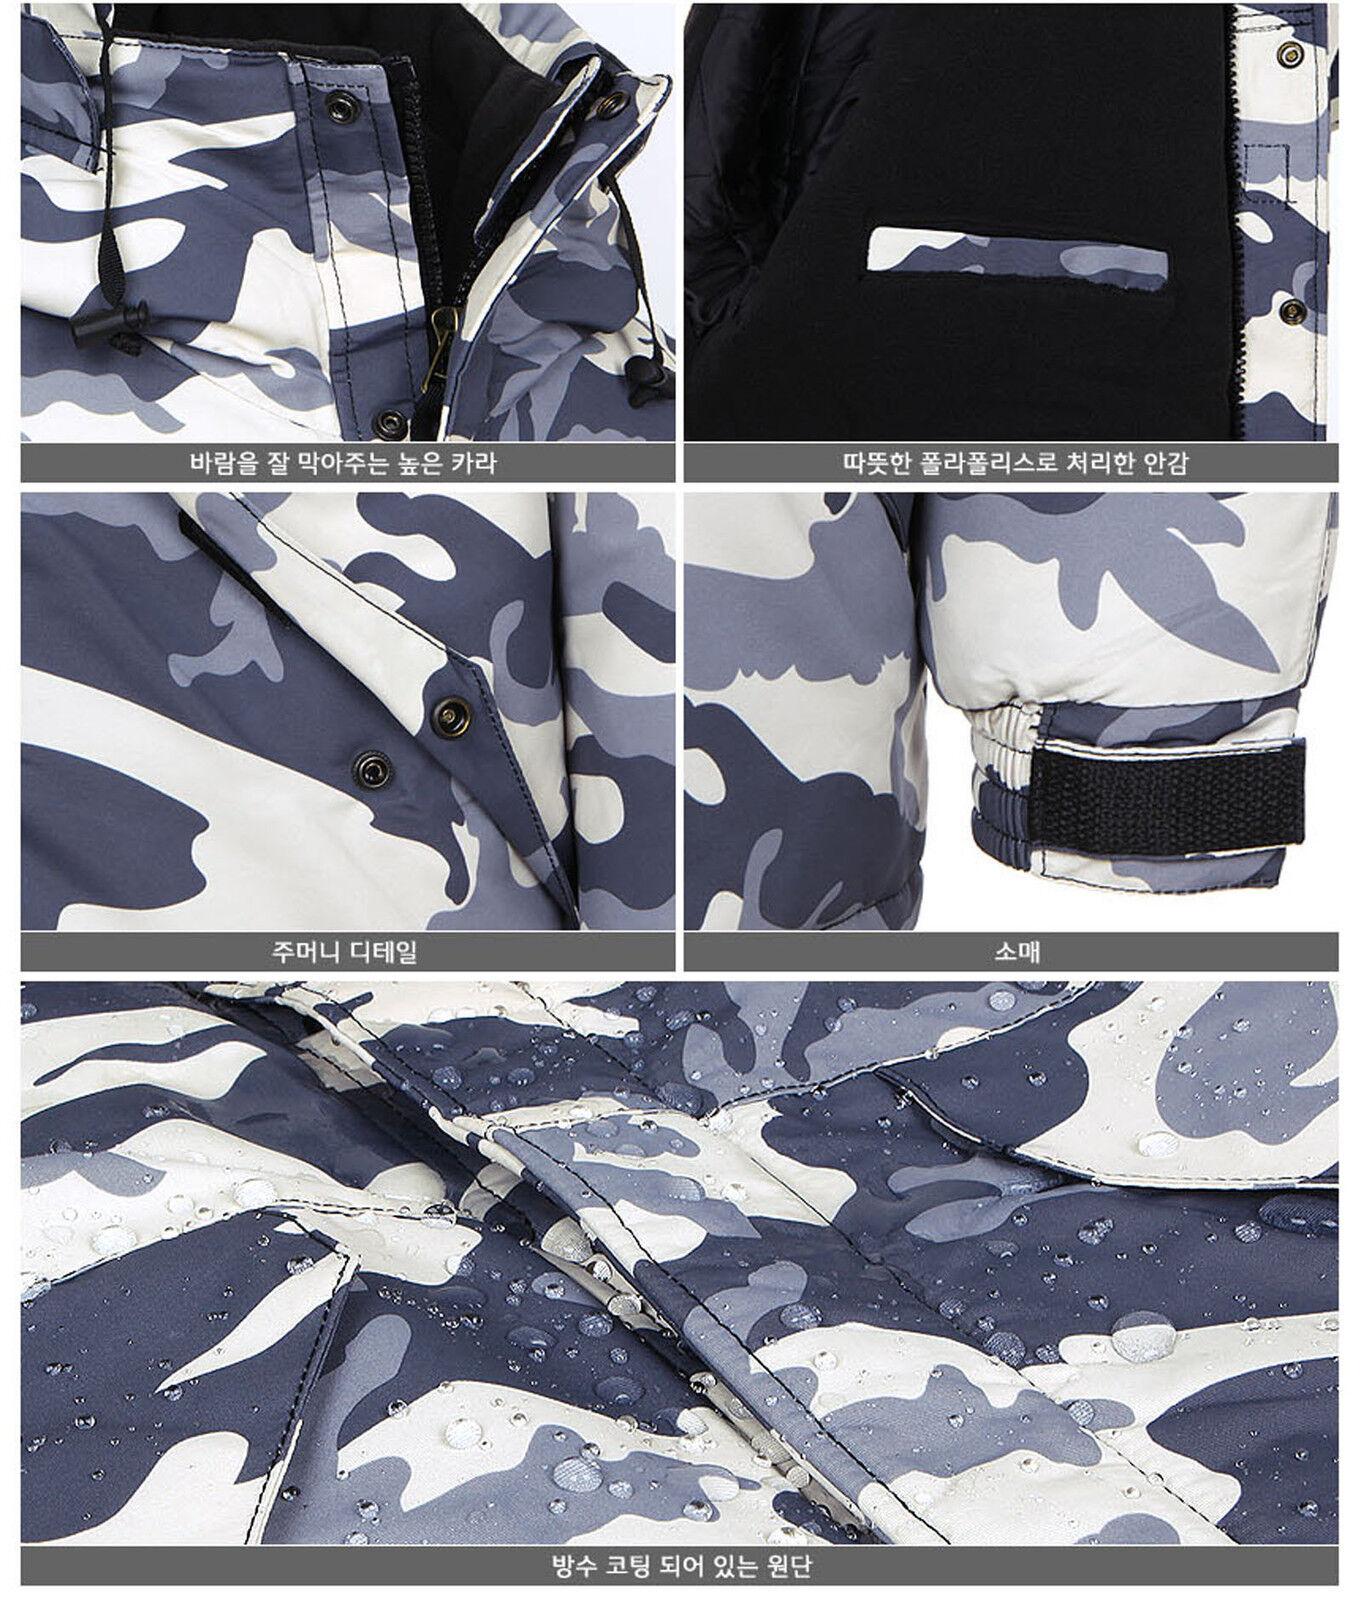 2019  Premium Premium Premium Edition Southplay Winter Waterproof  Camo Ivory Military Jacket 014bdf